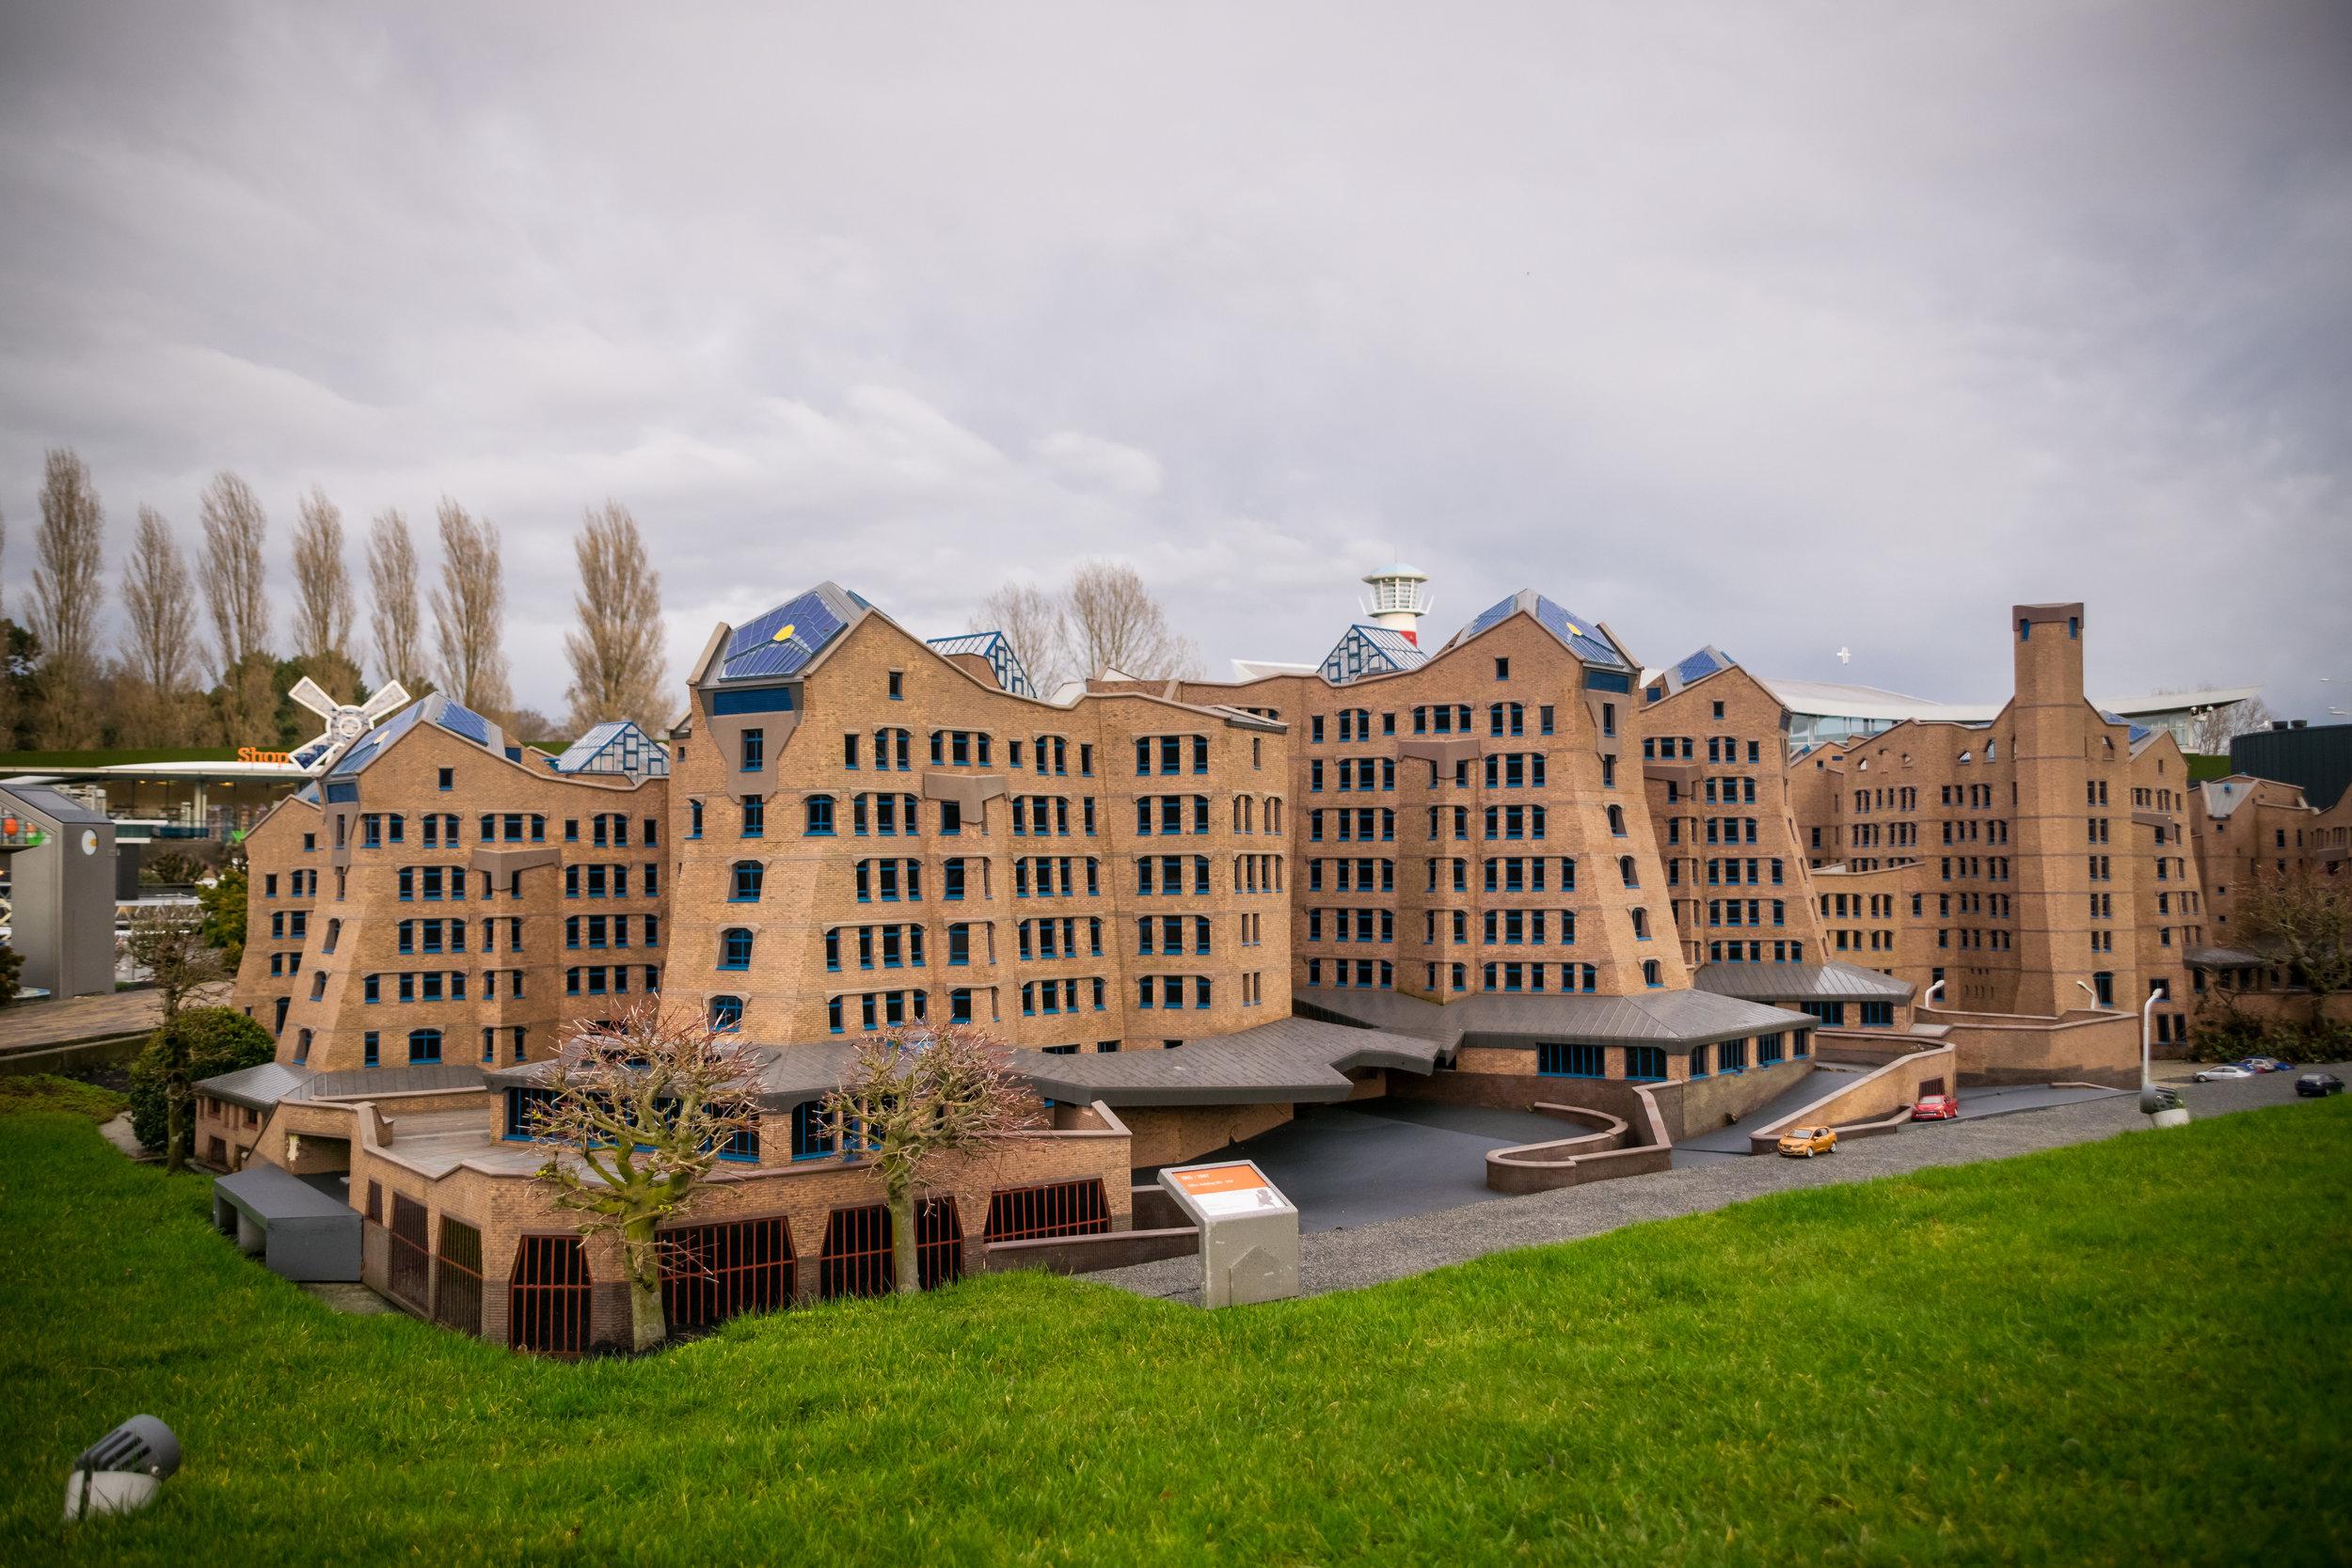 The Hague Madurodam-15.jpg